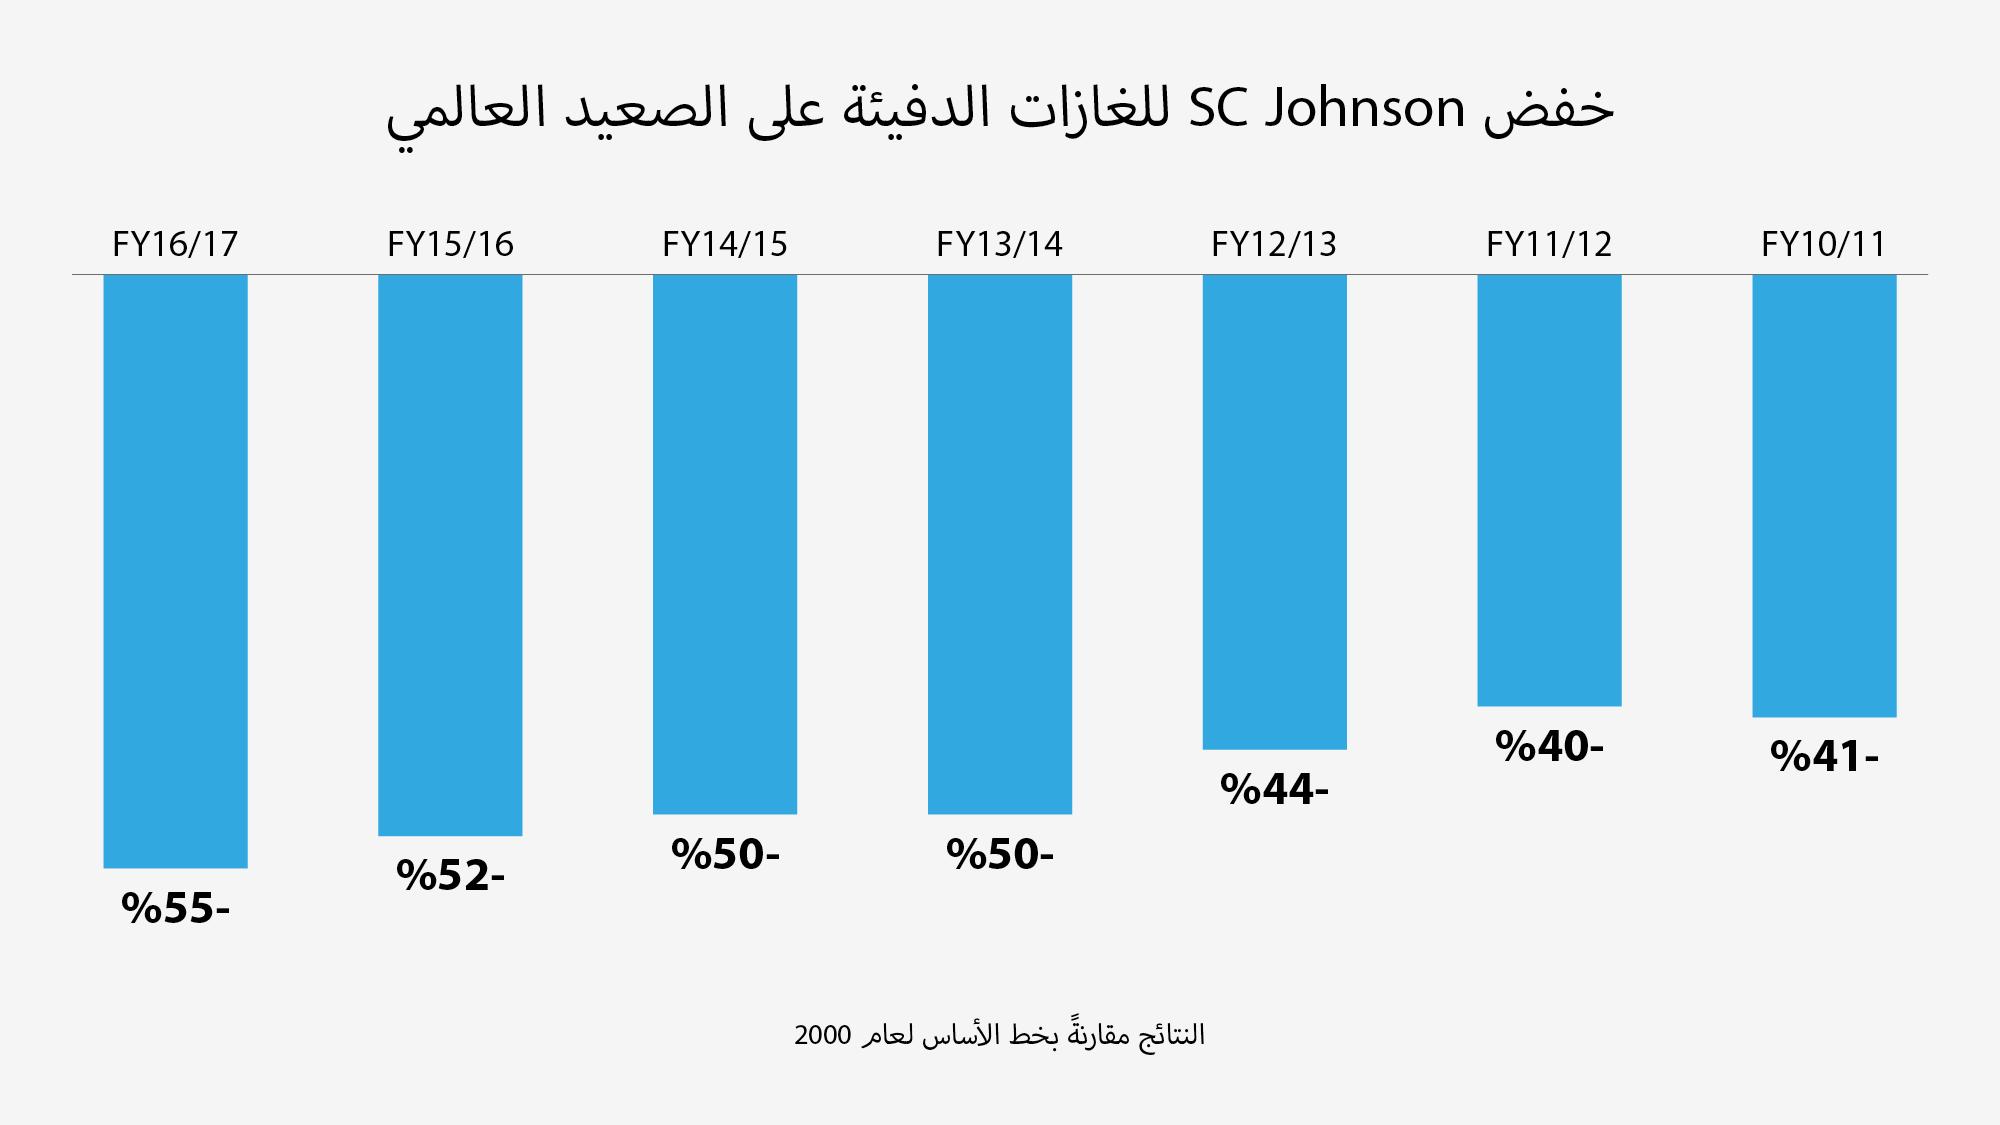 SCJ Johnson Global Greenhouse Gas Reduction